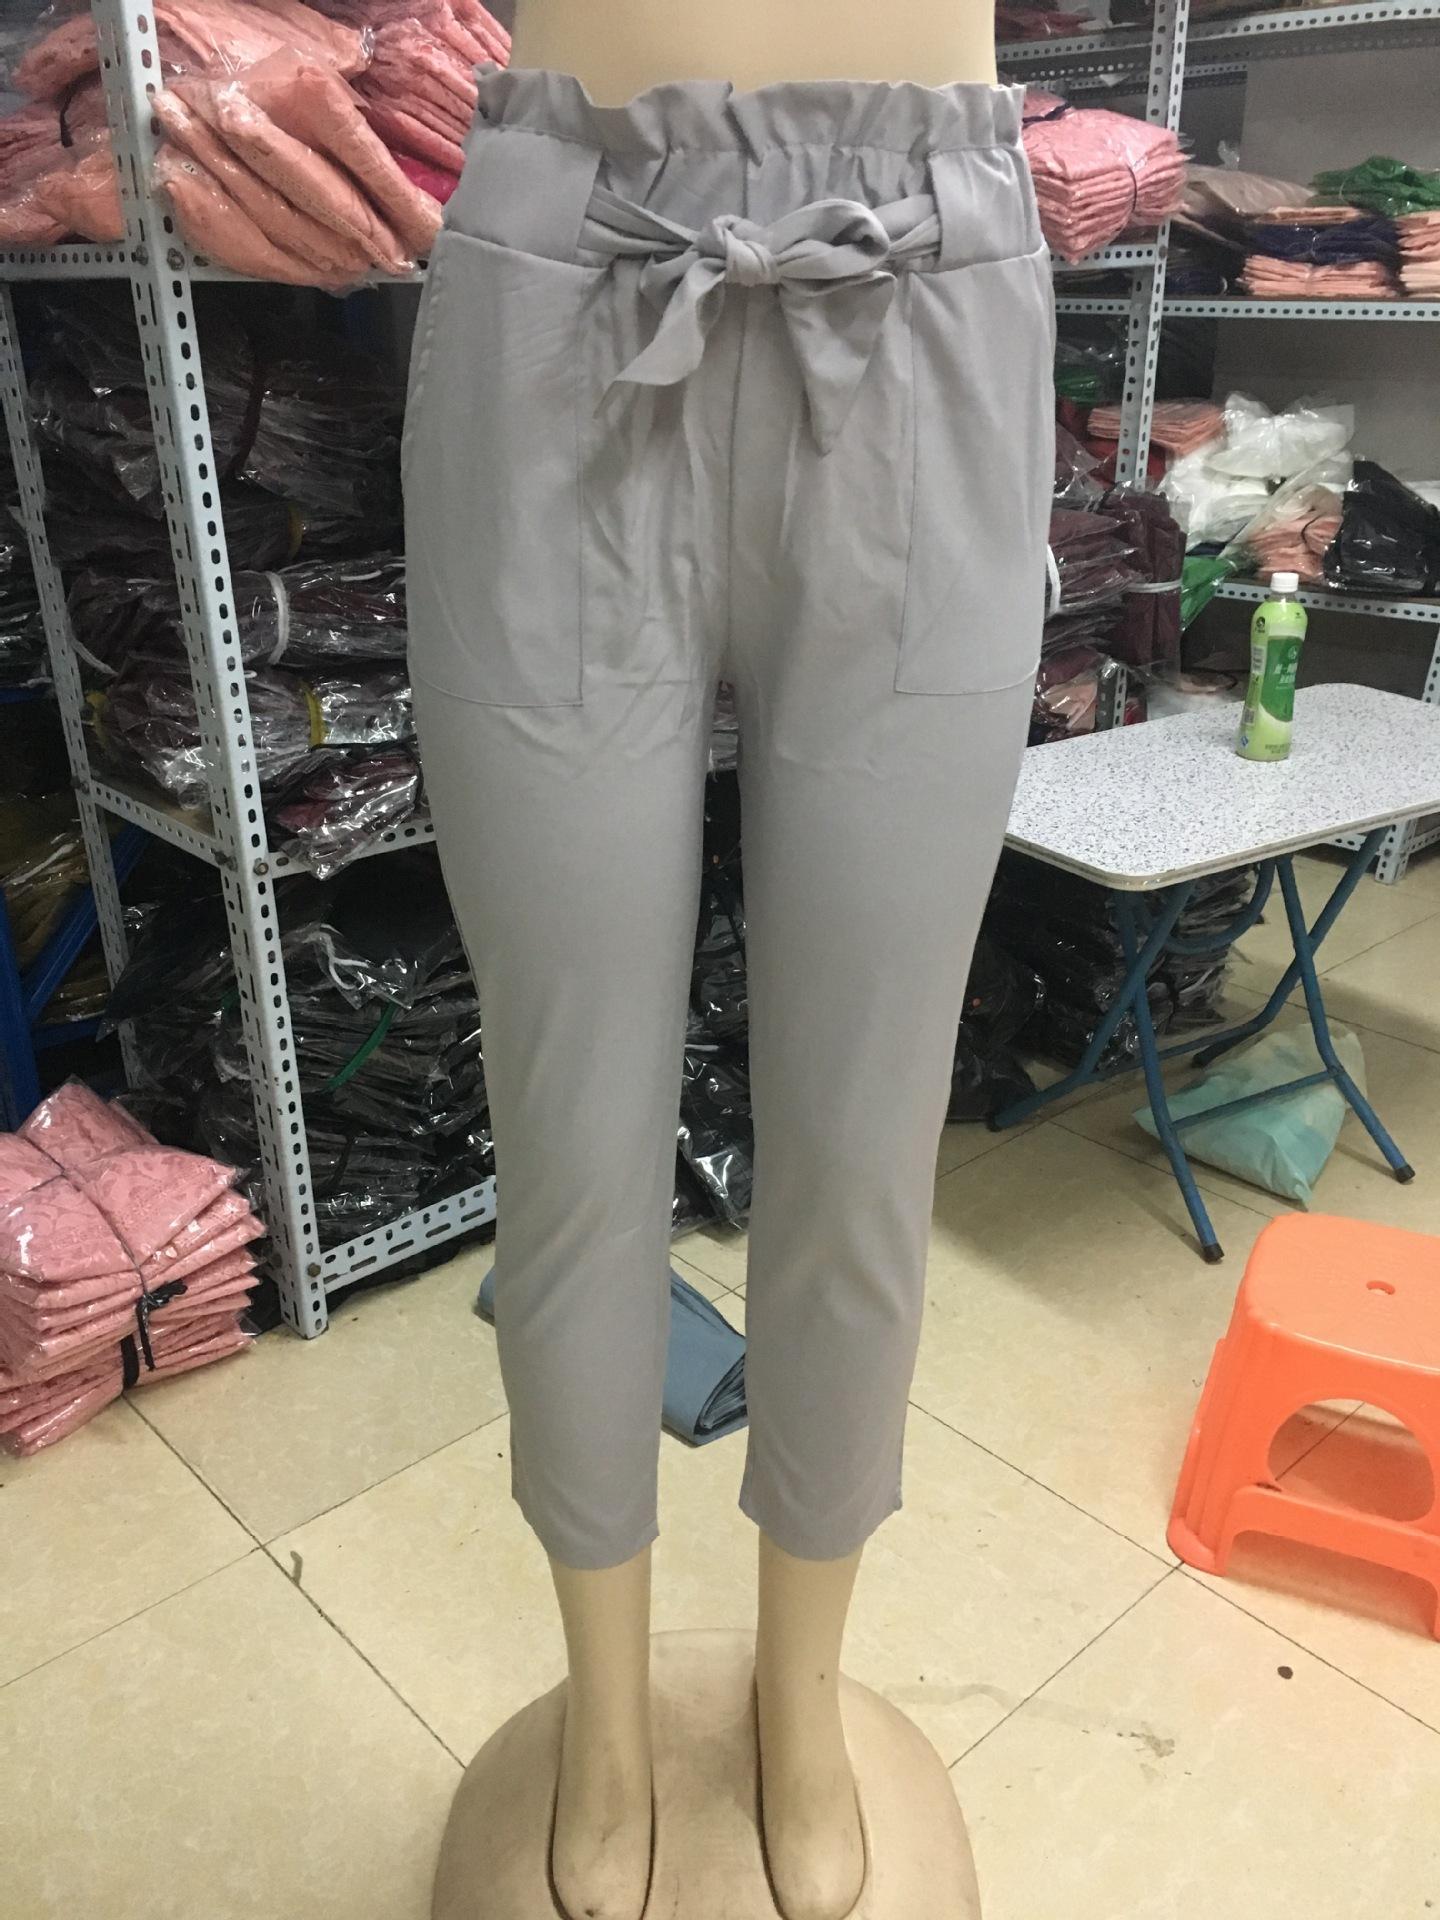 19 New Brand High Elastic Waist Harem Pants Women Spring Summer Fashion Ninth Pants Female Office Lady Black Trousers Belt 14